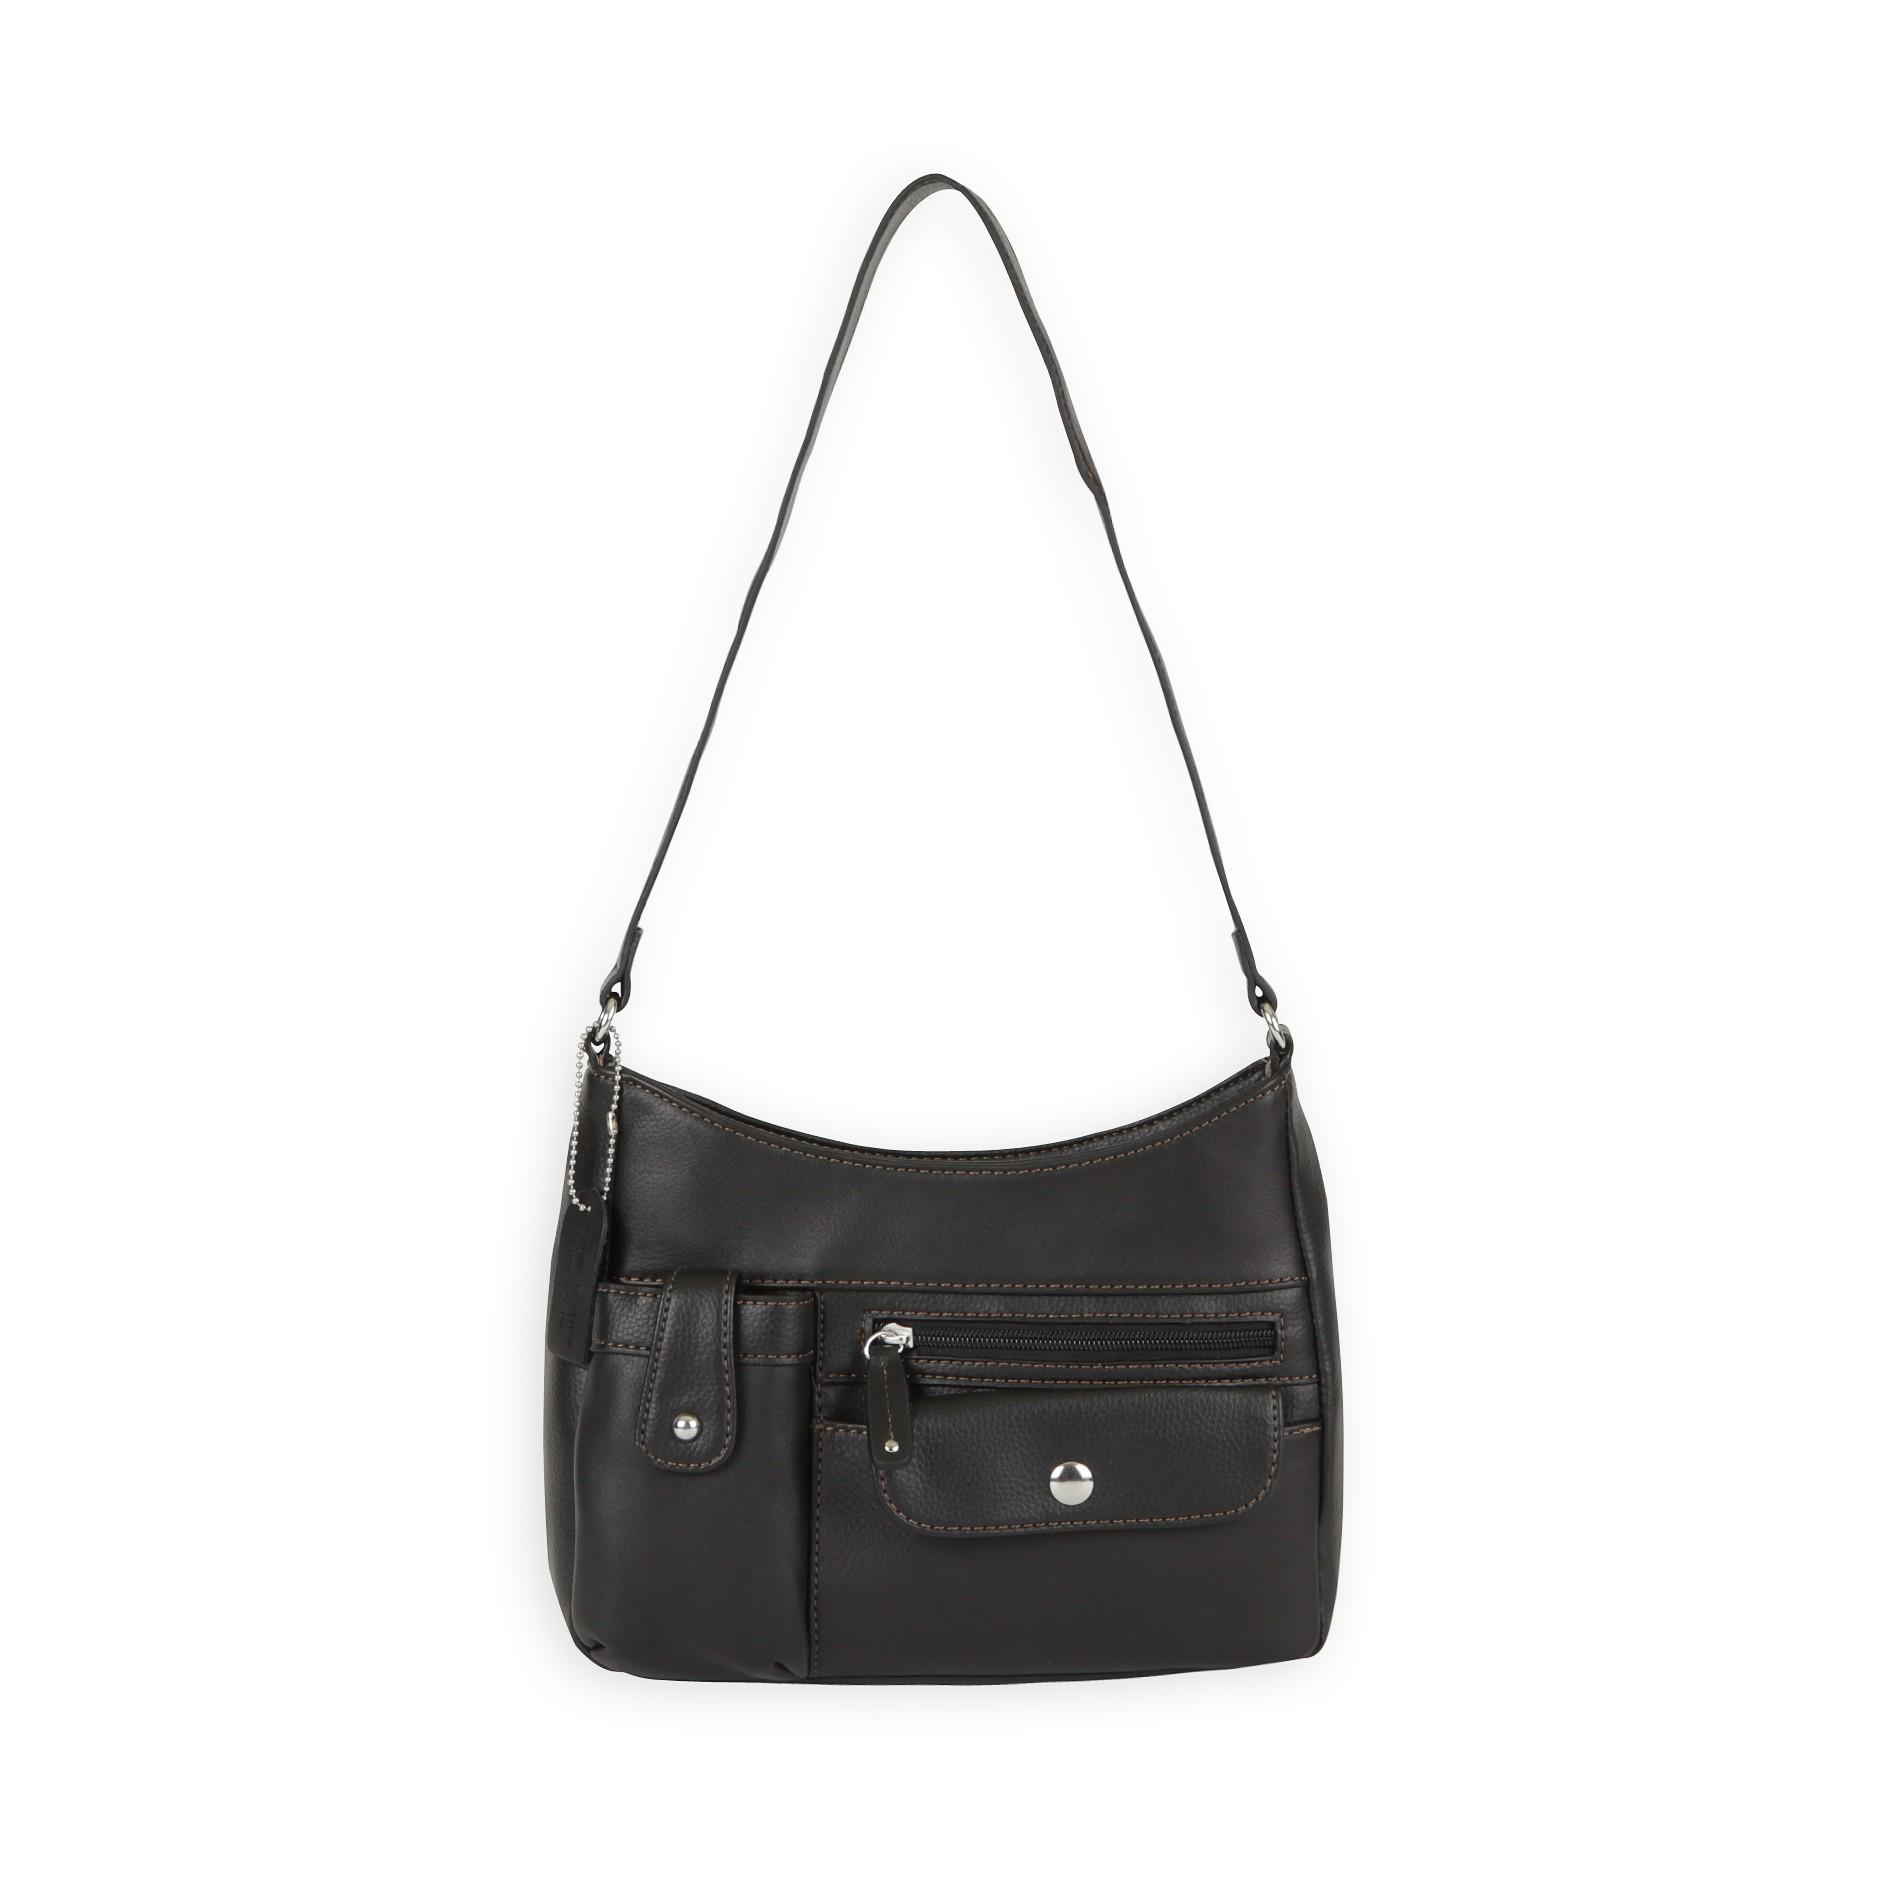 Jaclyn Smith Women's Faux Leather Hobo Bag